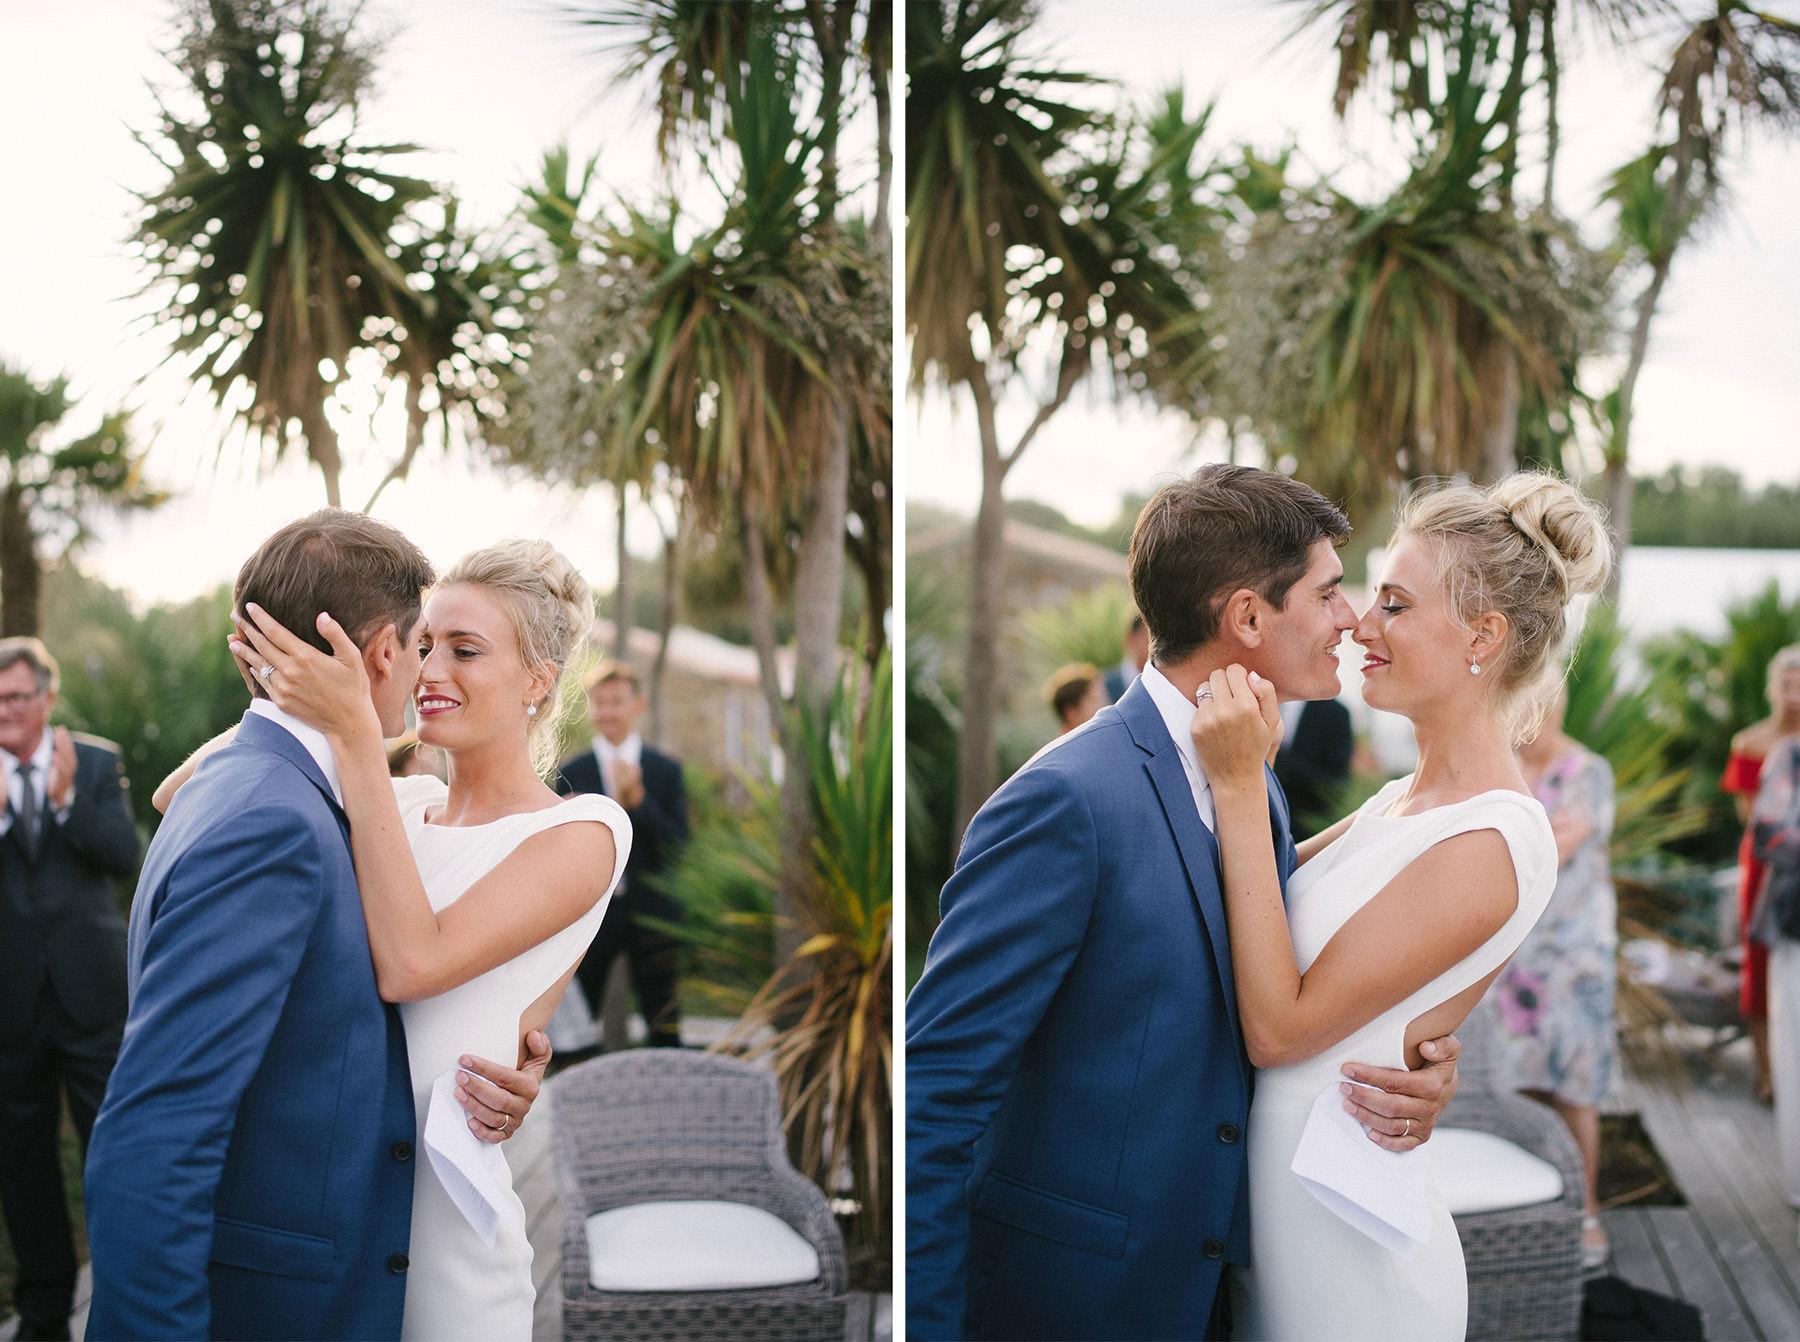 photographe-mariage-ile-d-yeu-00066